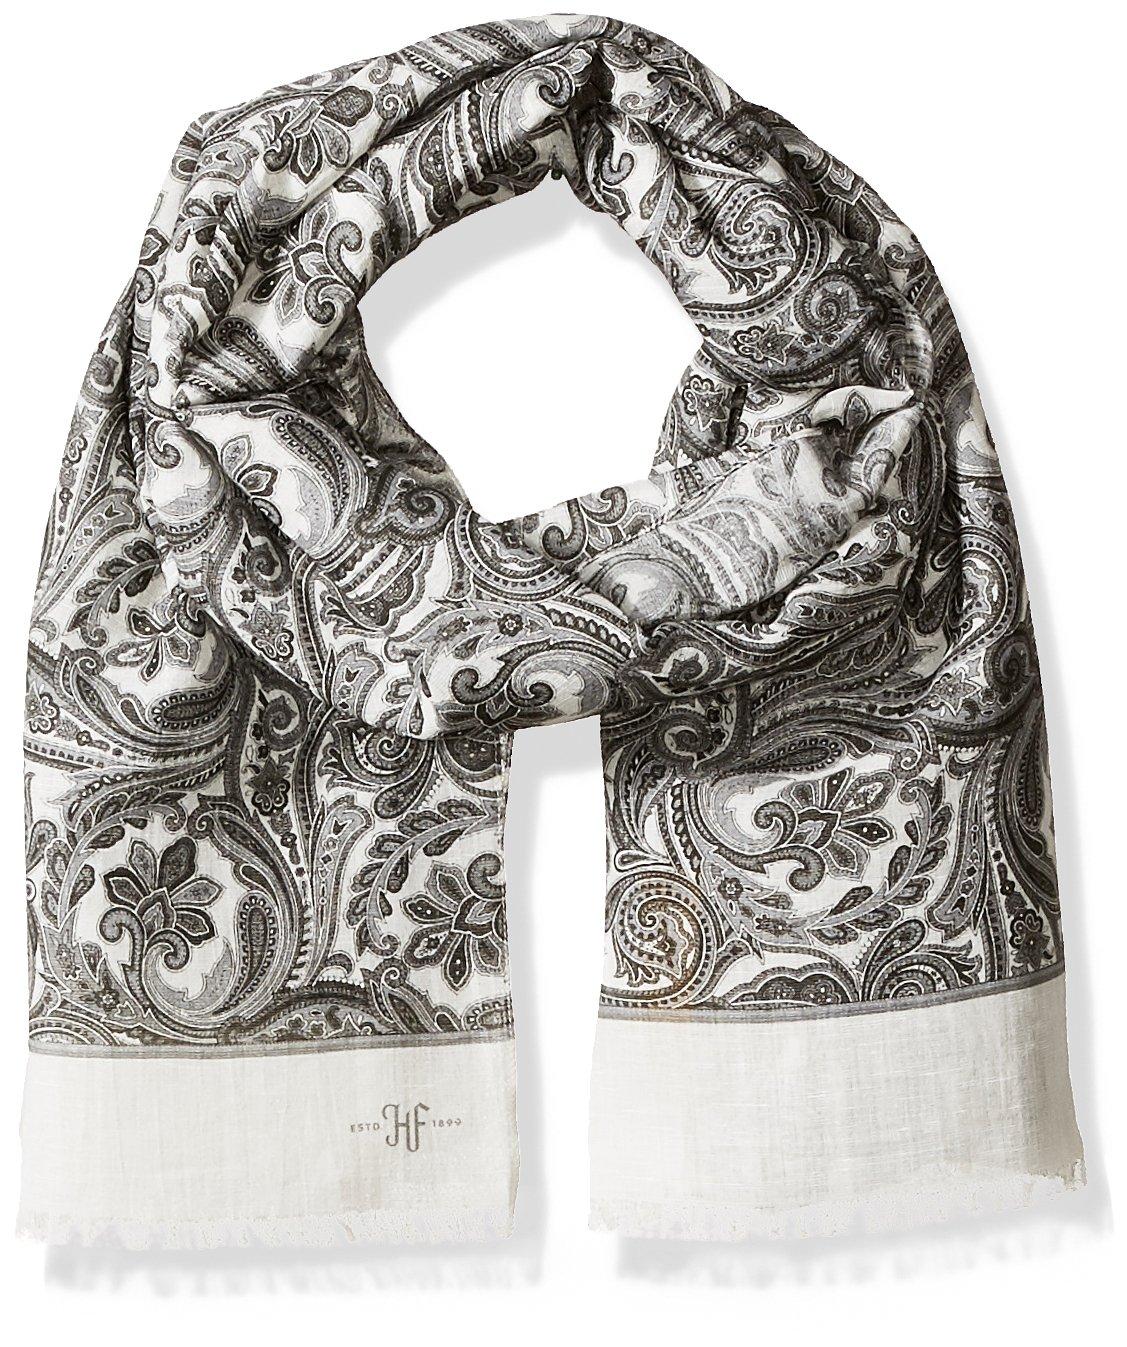 Hickey Freeman Men's Italian Wool Silk Jacquard Paisley Scarf, White, One Size